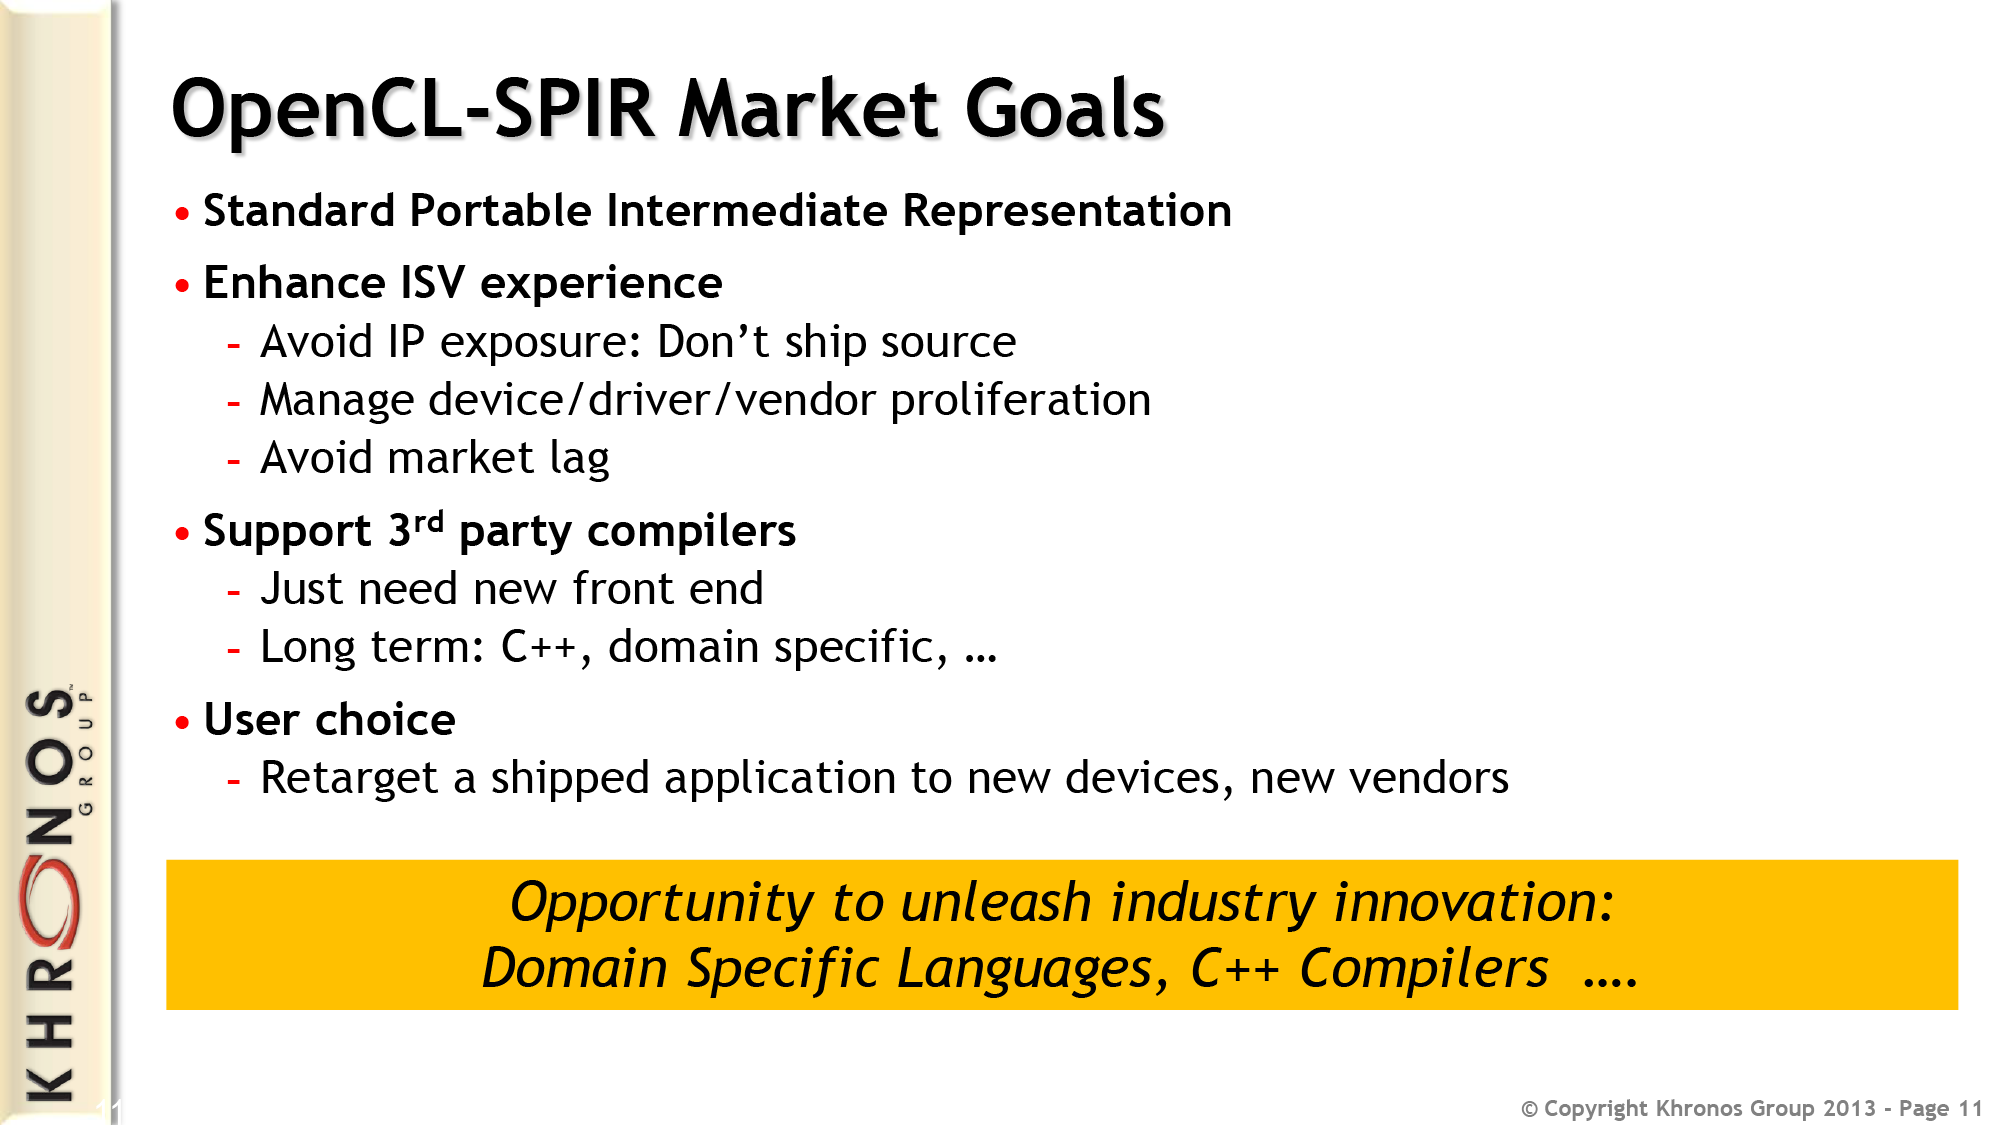 OpenCL SPIR 1 2: An Intermediate Format For OpenCL - Khronos